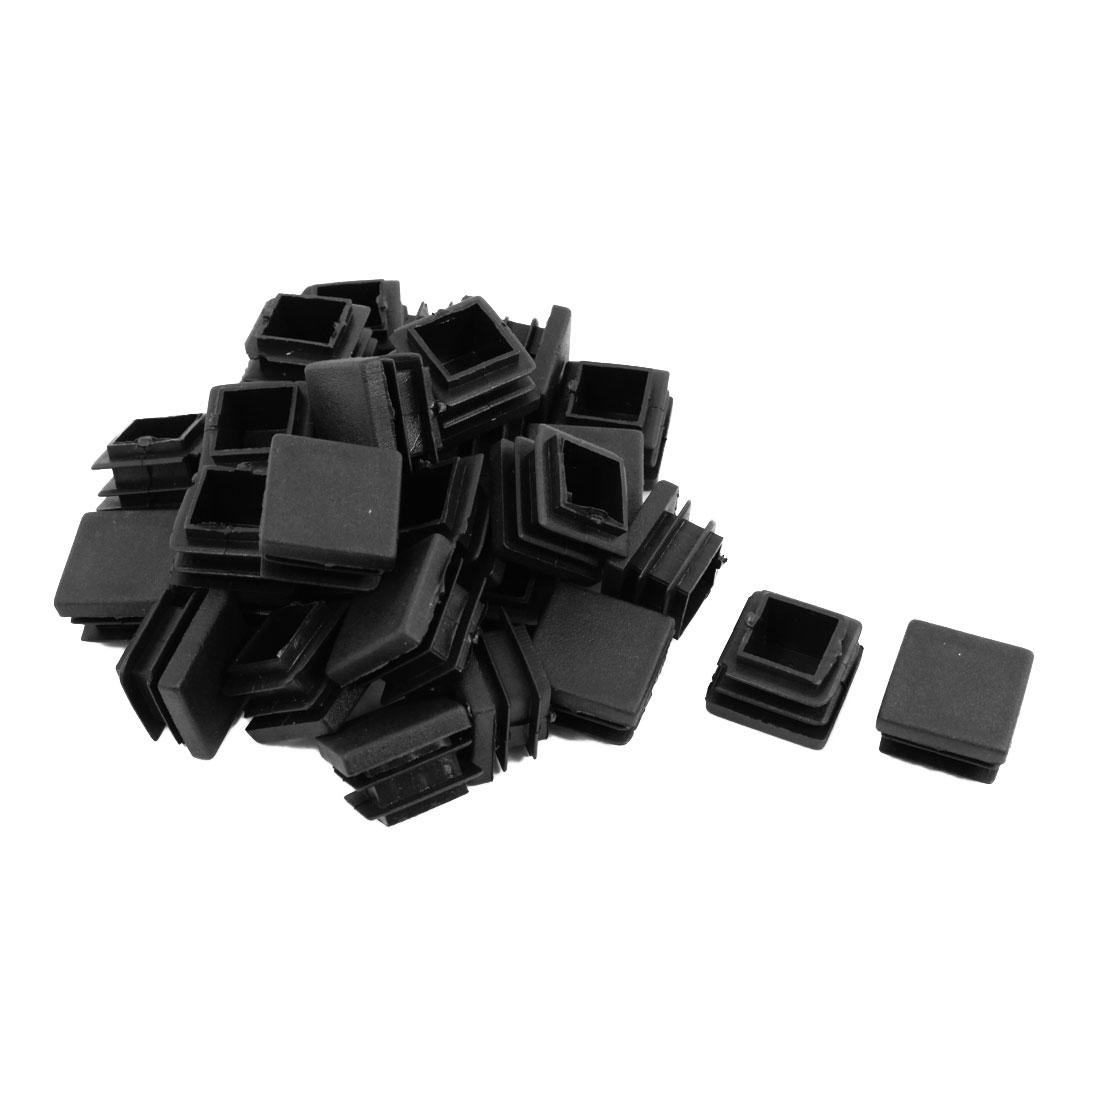 30 Pcs Black Plastic Square Tube Inserts End Blanking Cap 22mm x 22mm